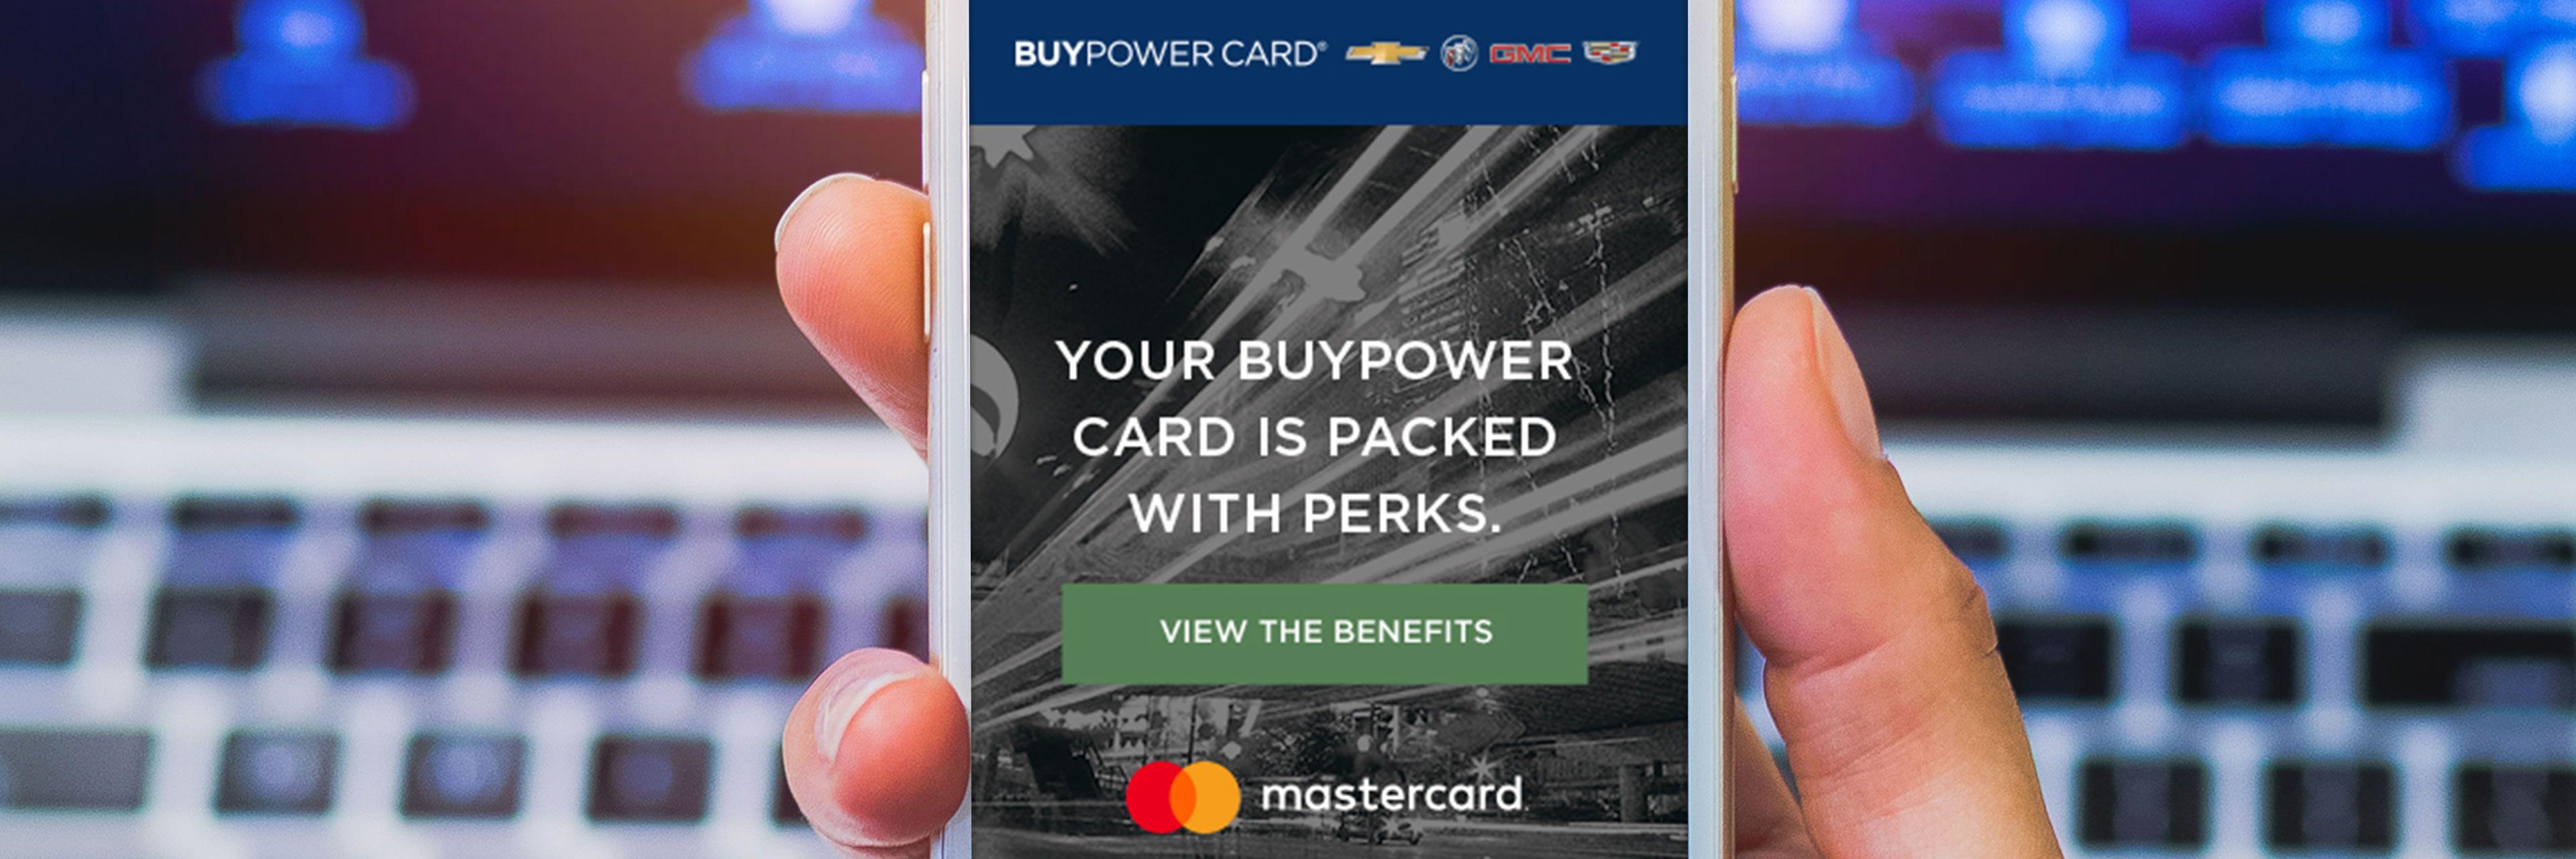 Buypower Business Card Com Myaccount Auch Gm Buypower